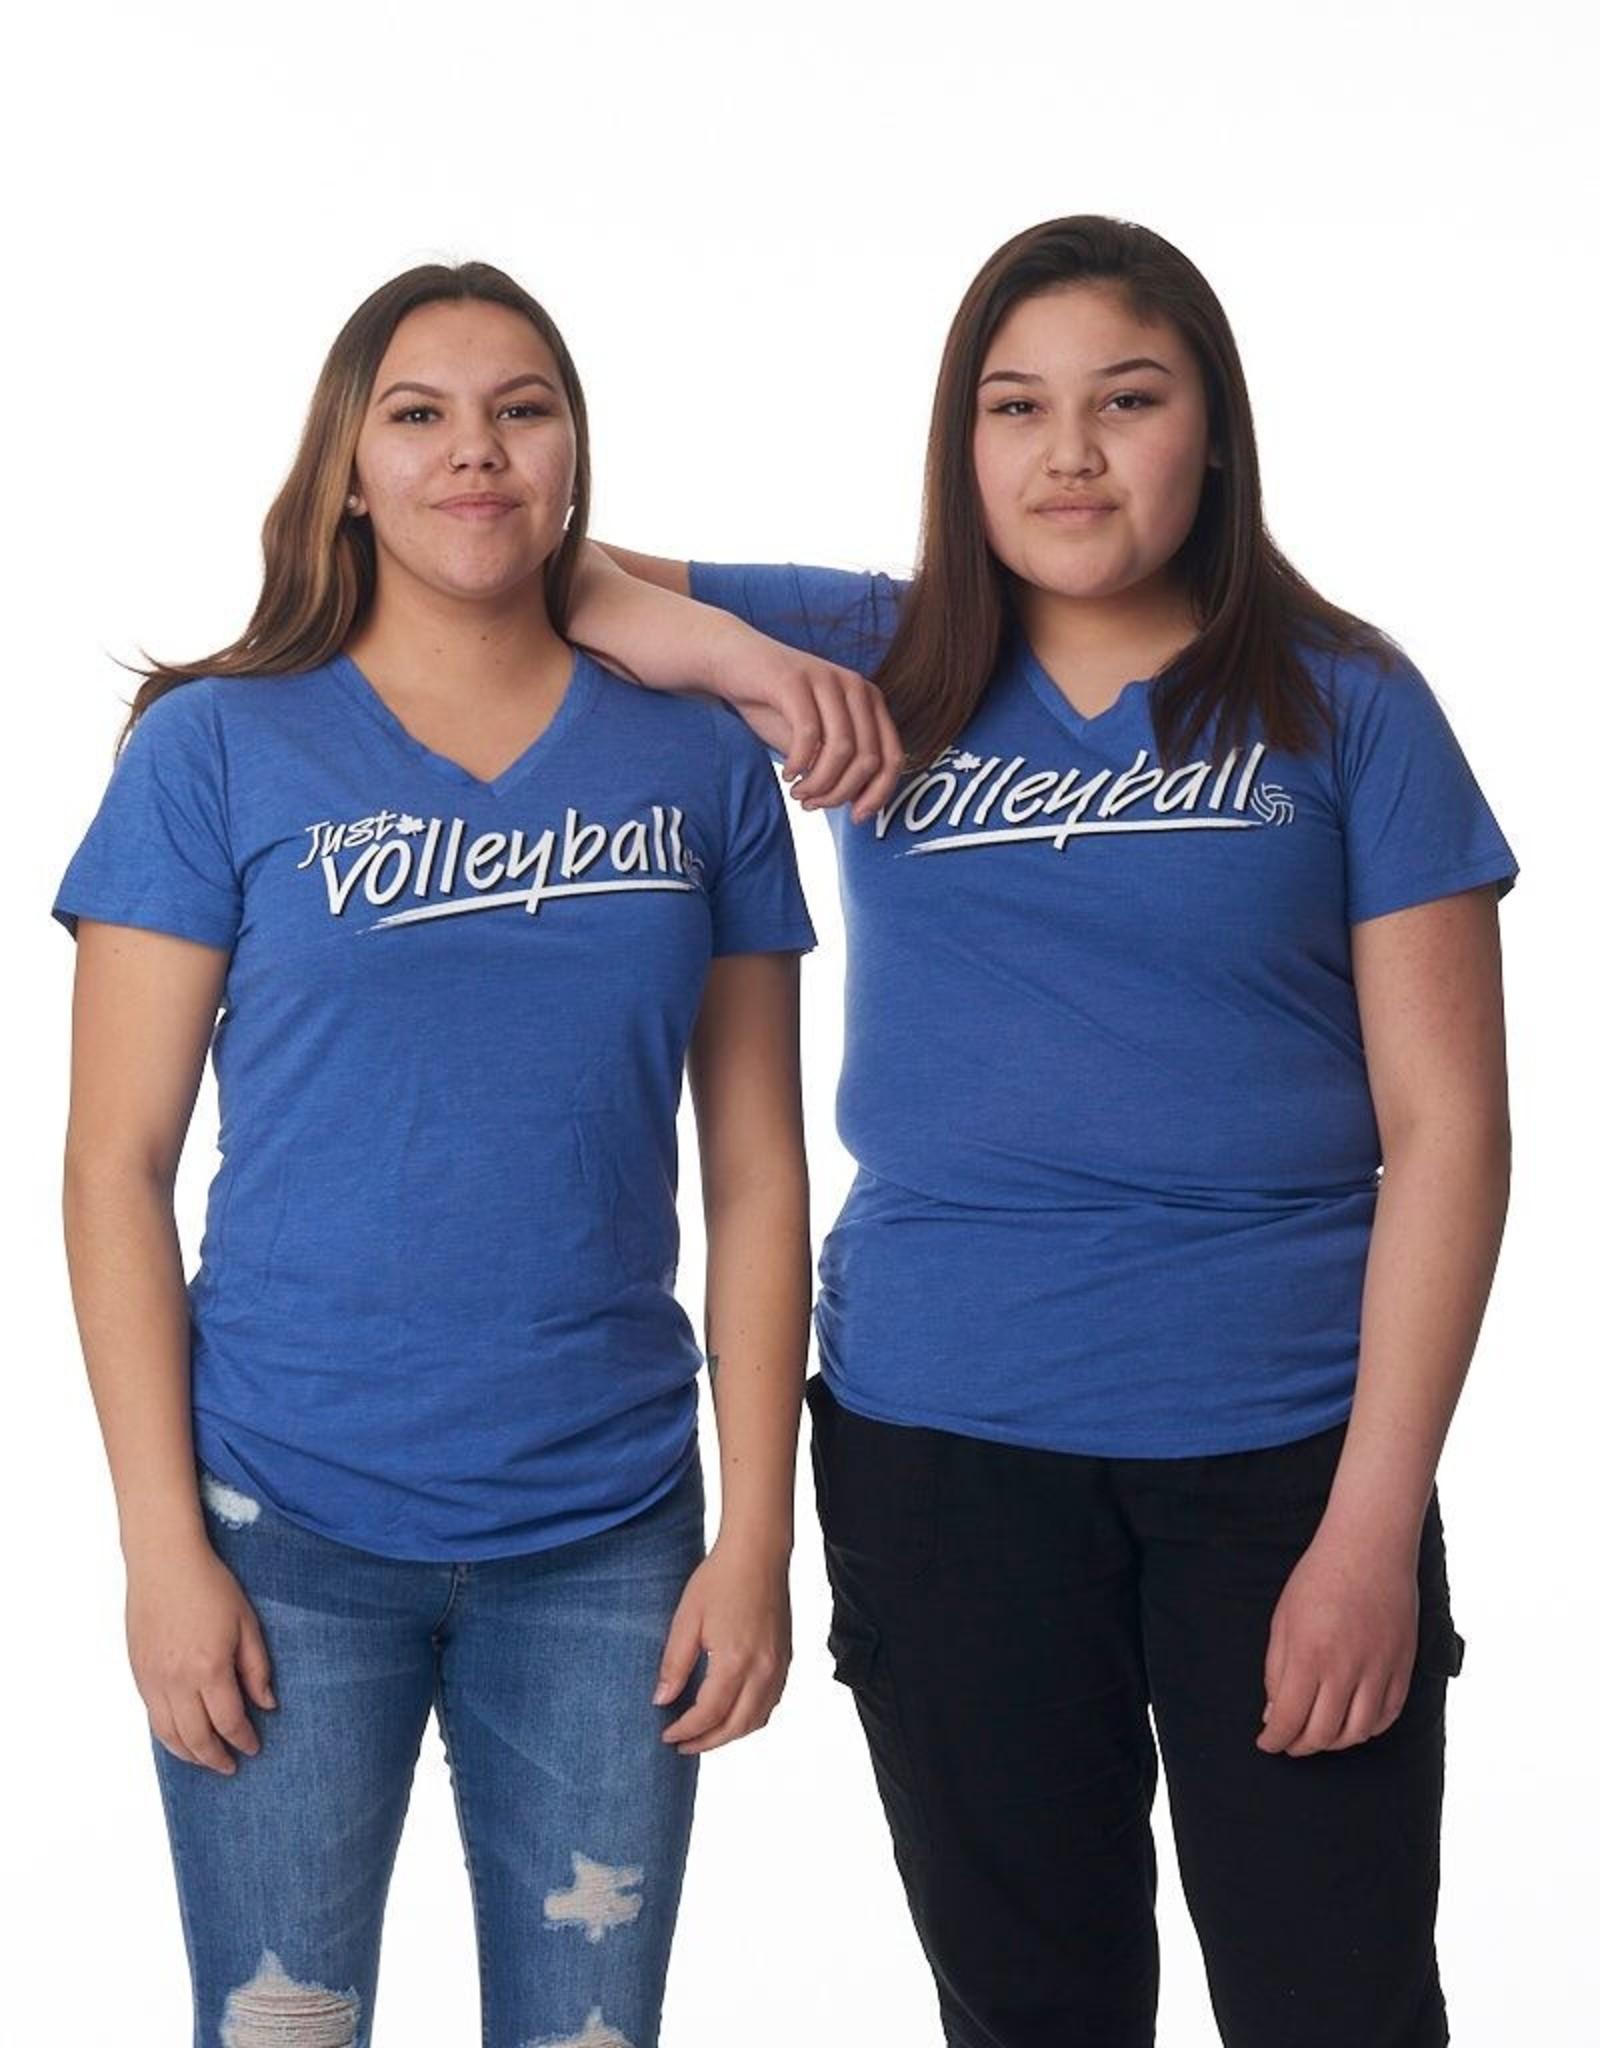 Just Volleyball JV Women's S/S Vneck Tee Koi8022